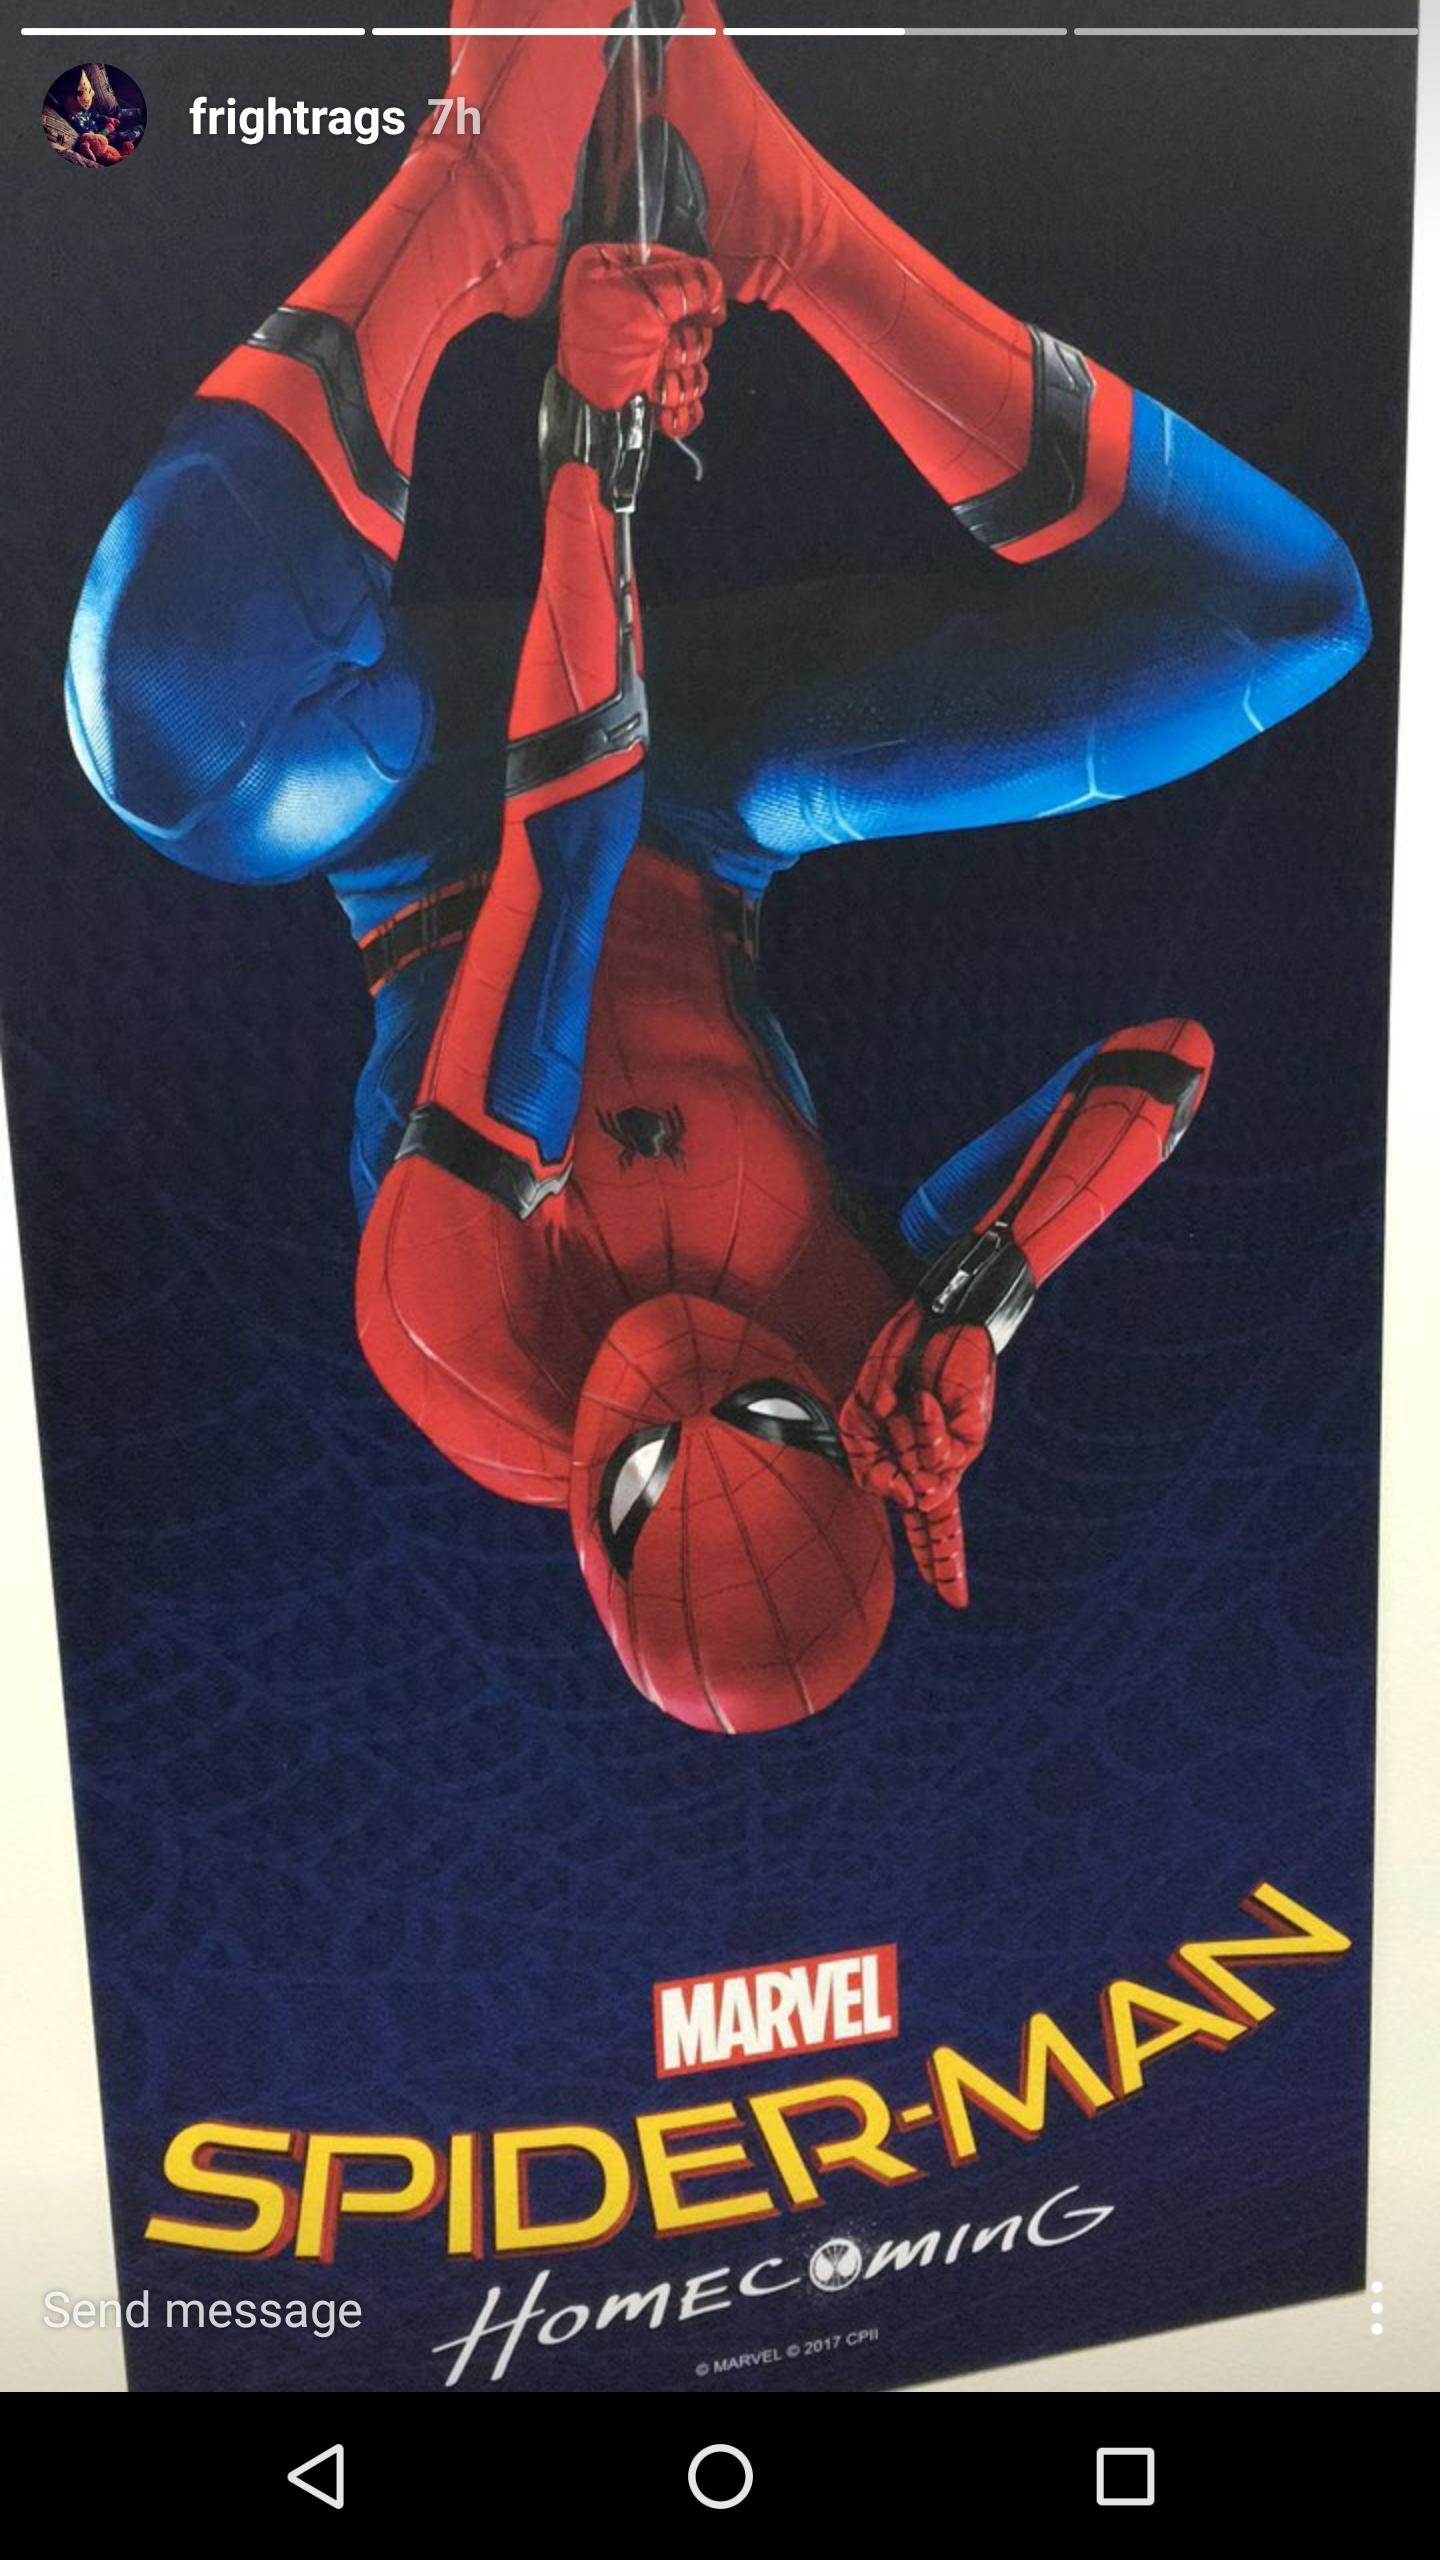 SpiderManHomecomingPosterVegas